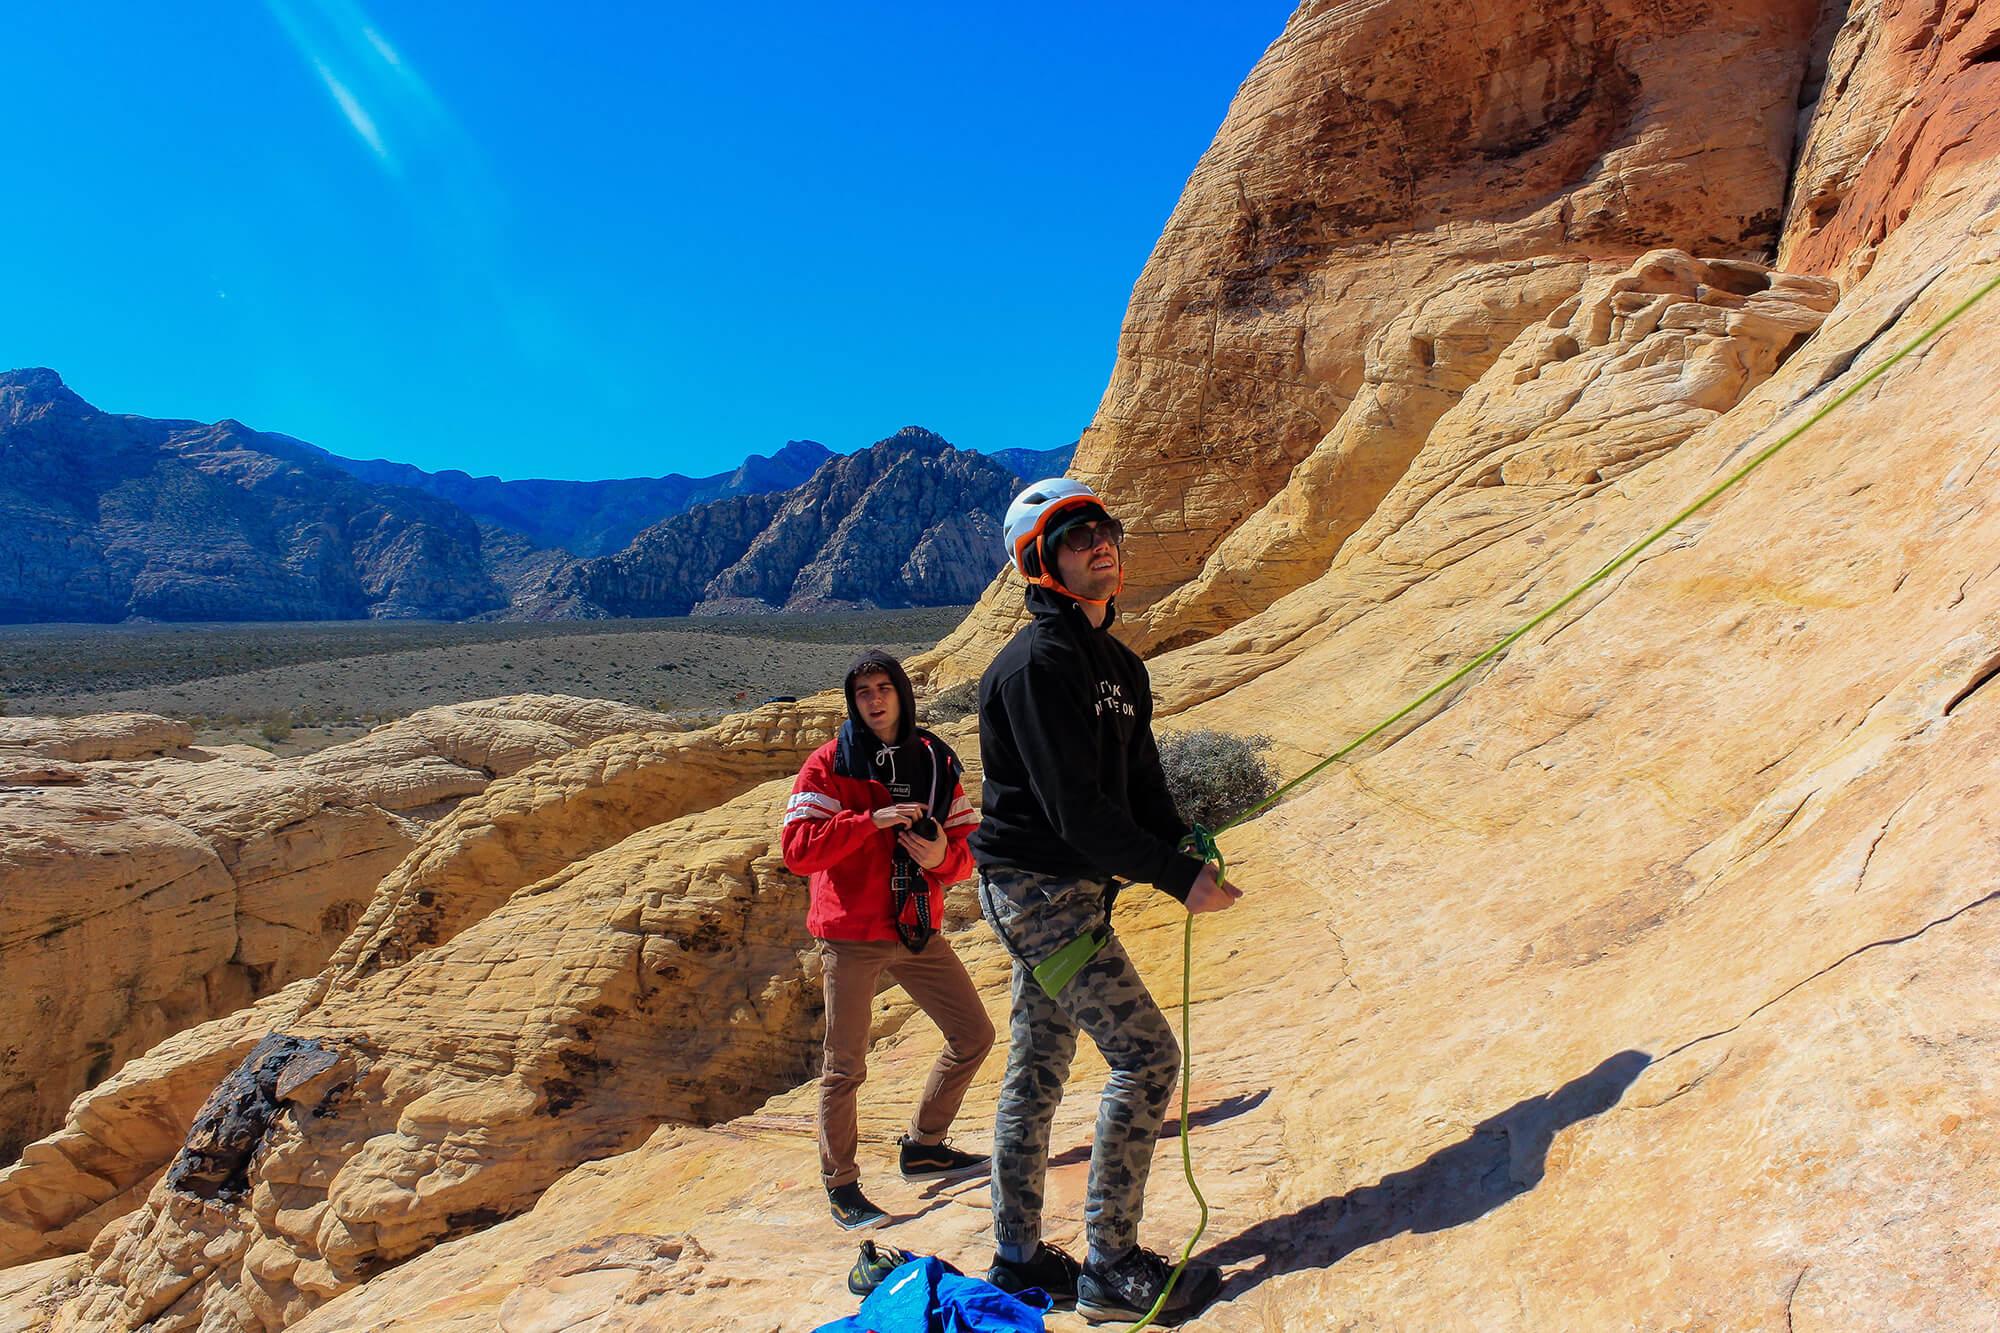 Red Rocks Climbing